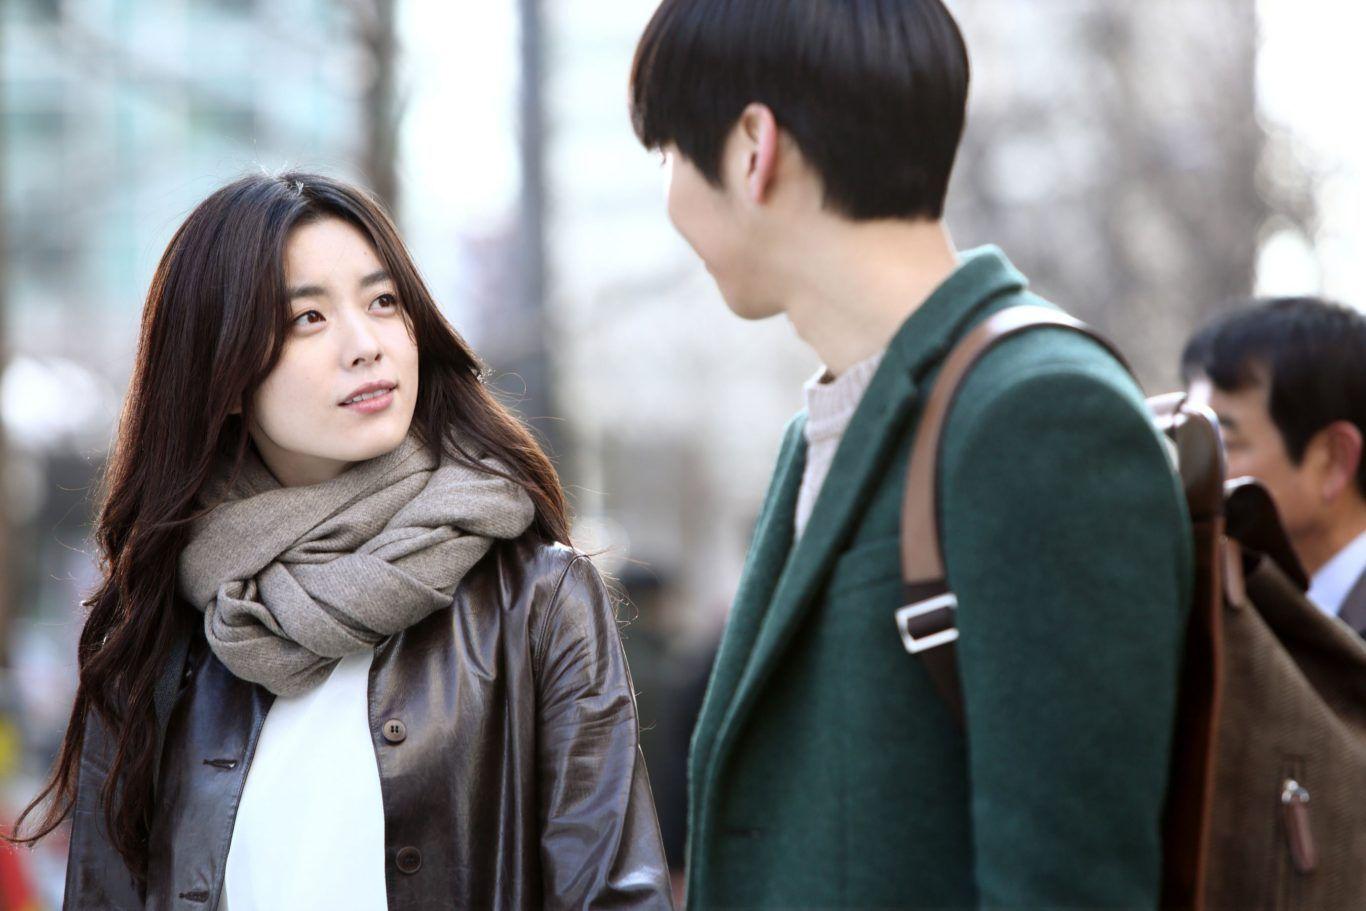 The Beauty Inside [02] (Korean Drama) Film komedi